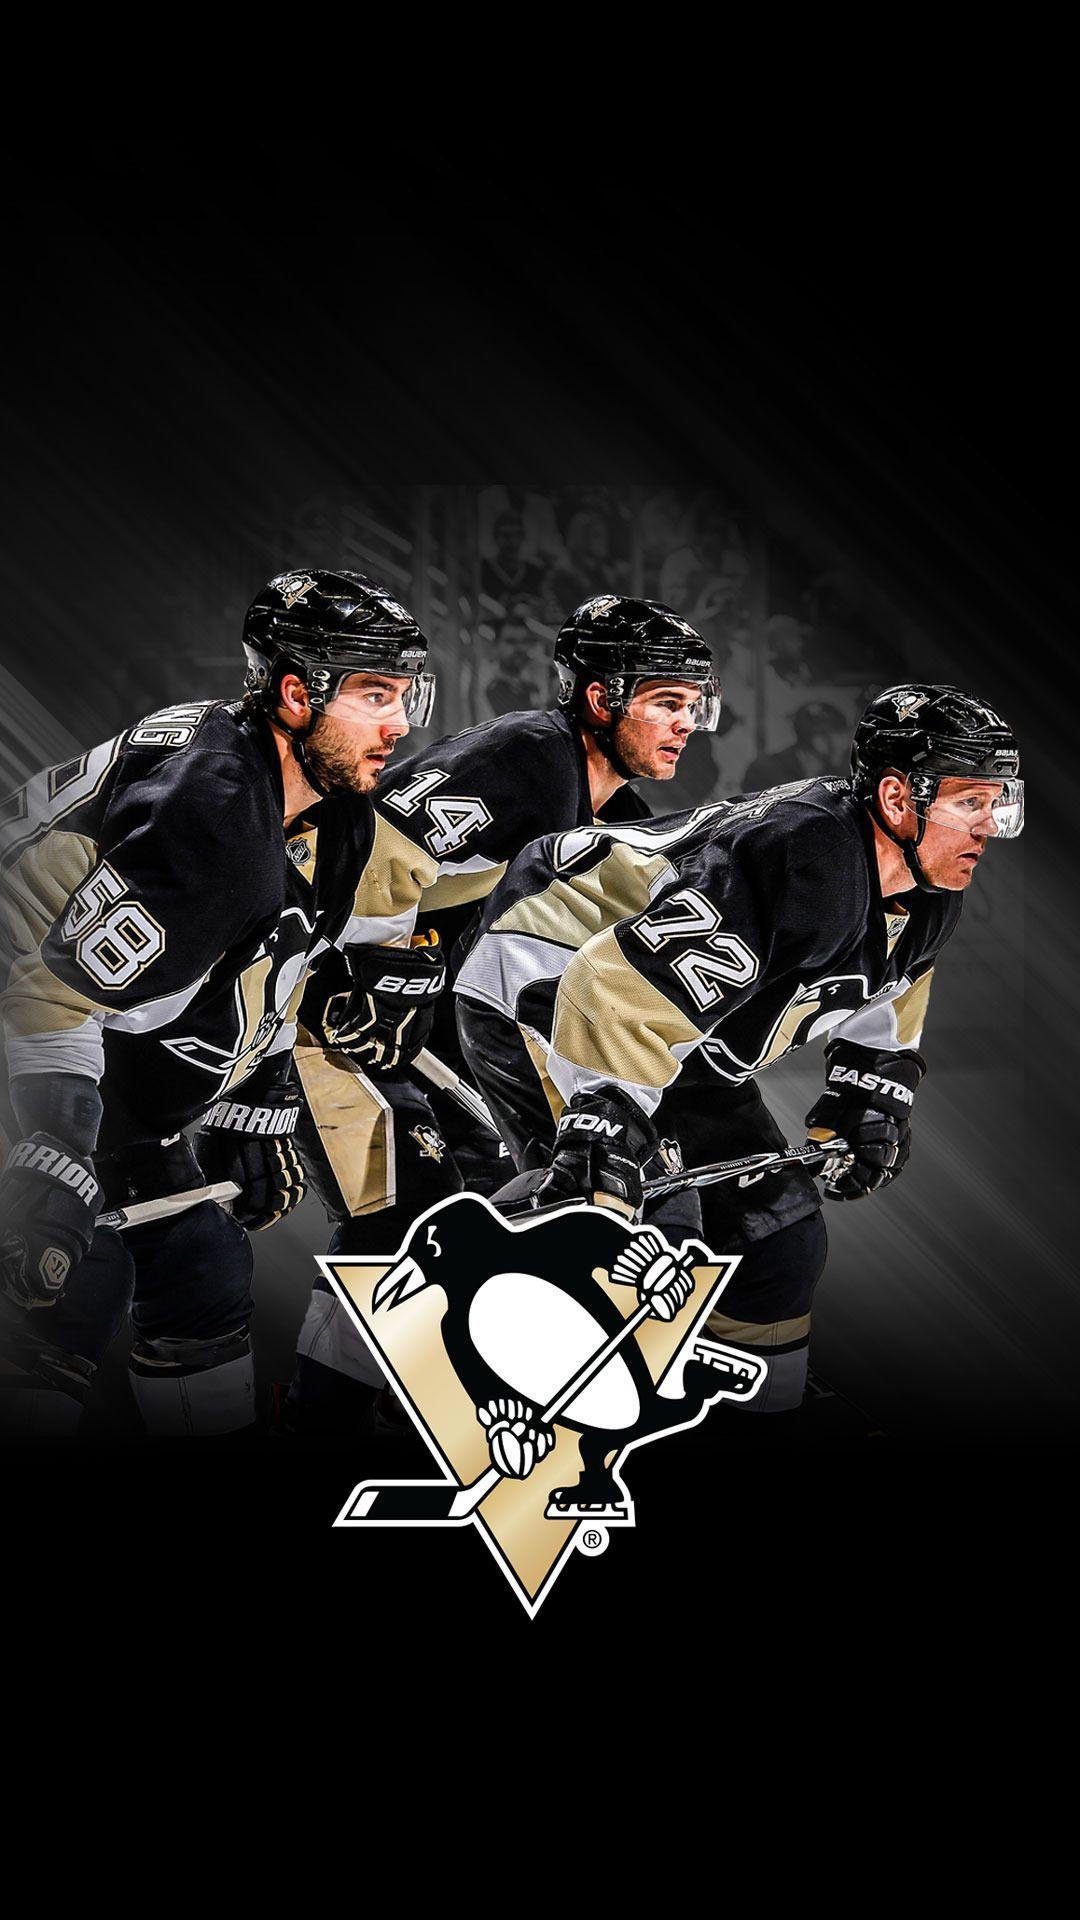 Pittsburgh Penguins 2018 Wallpapers - Wallpaper Cave